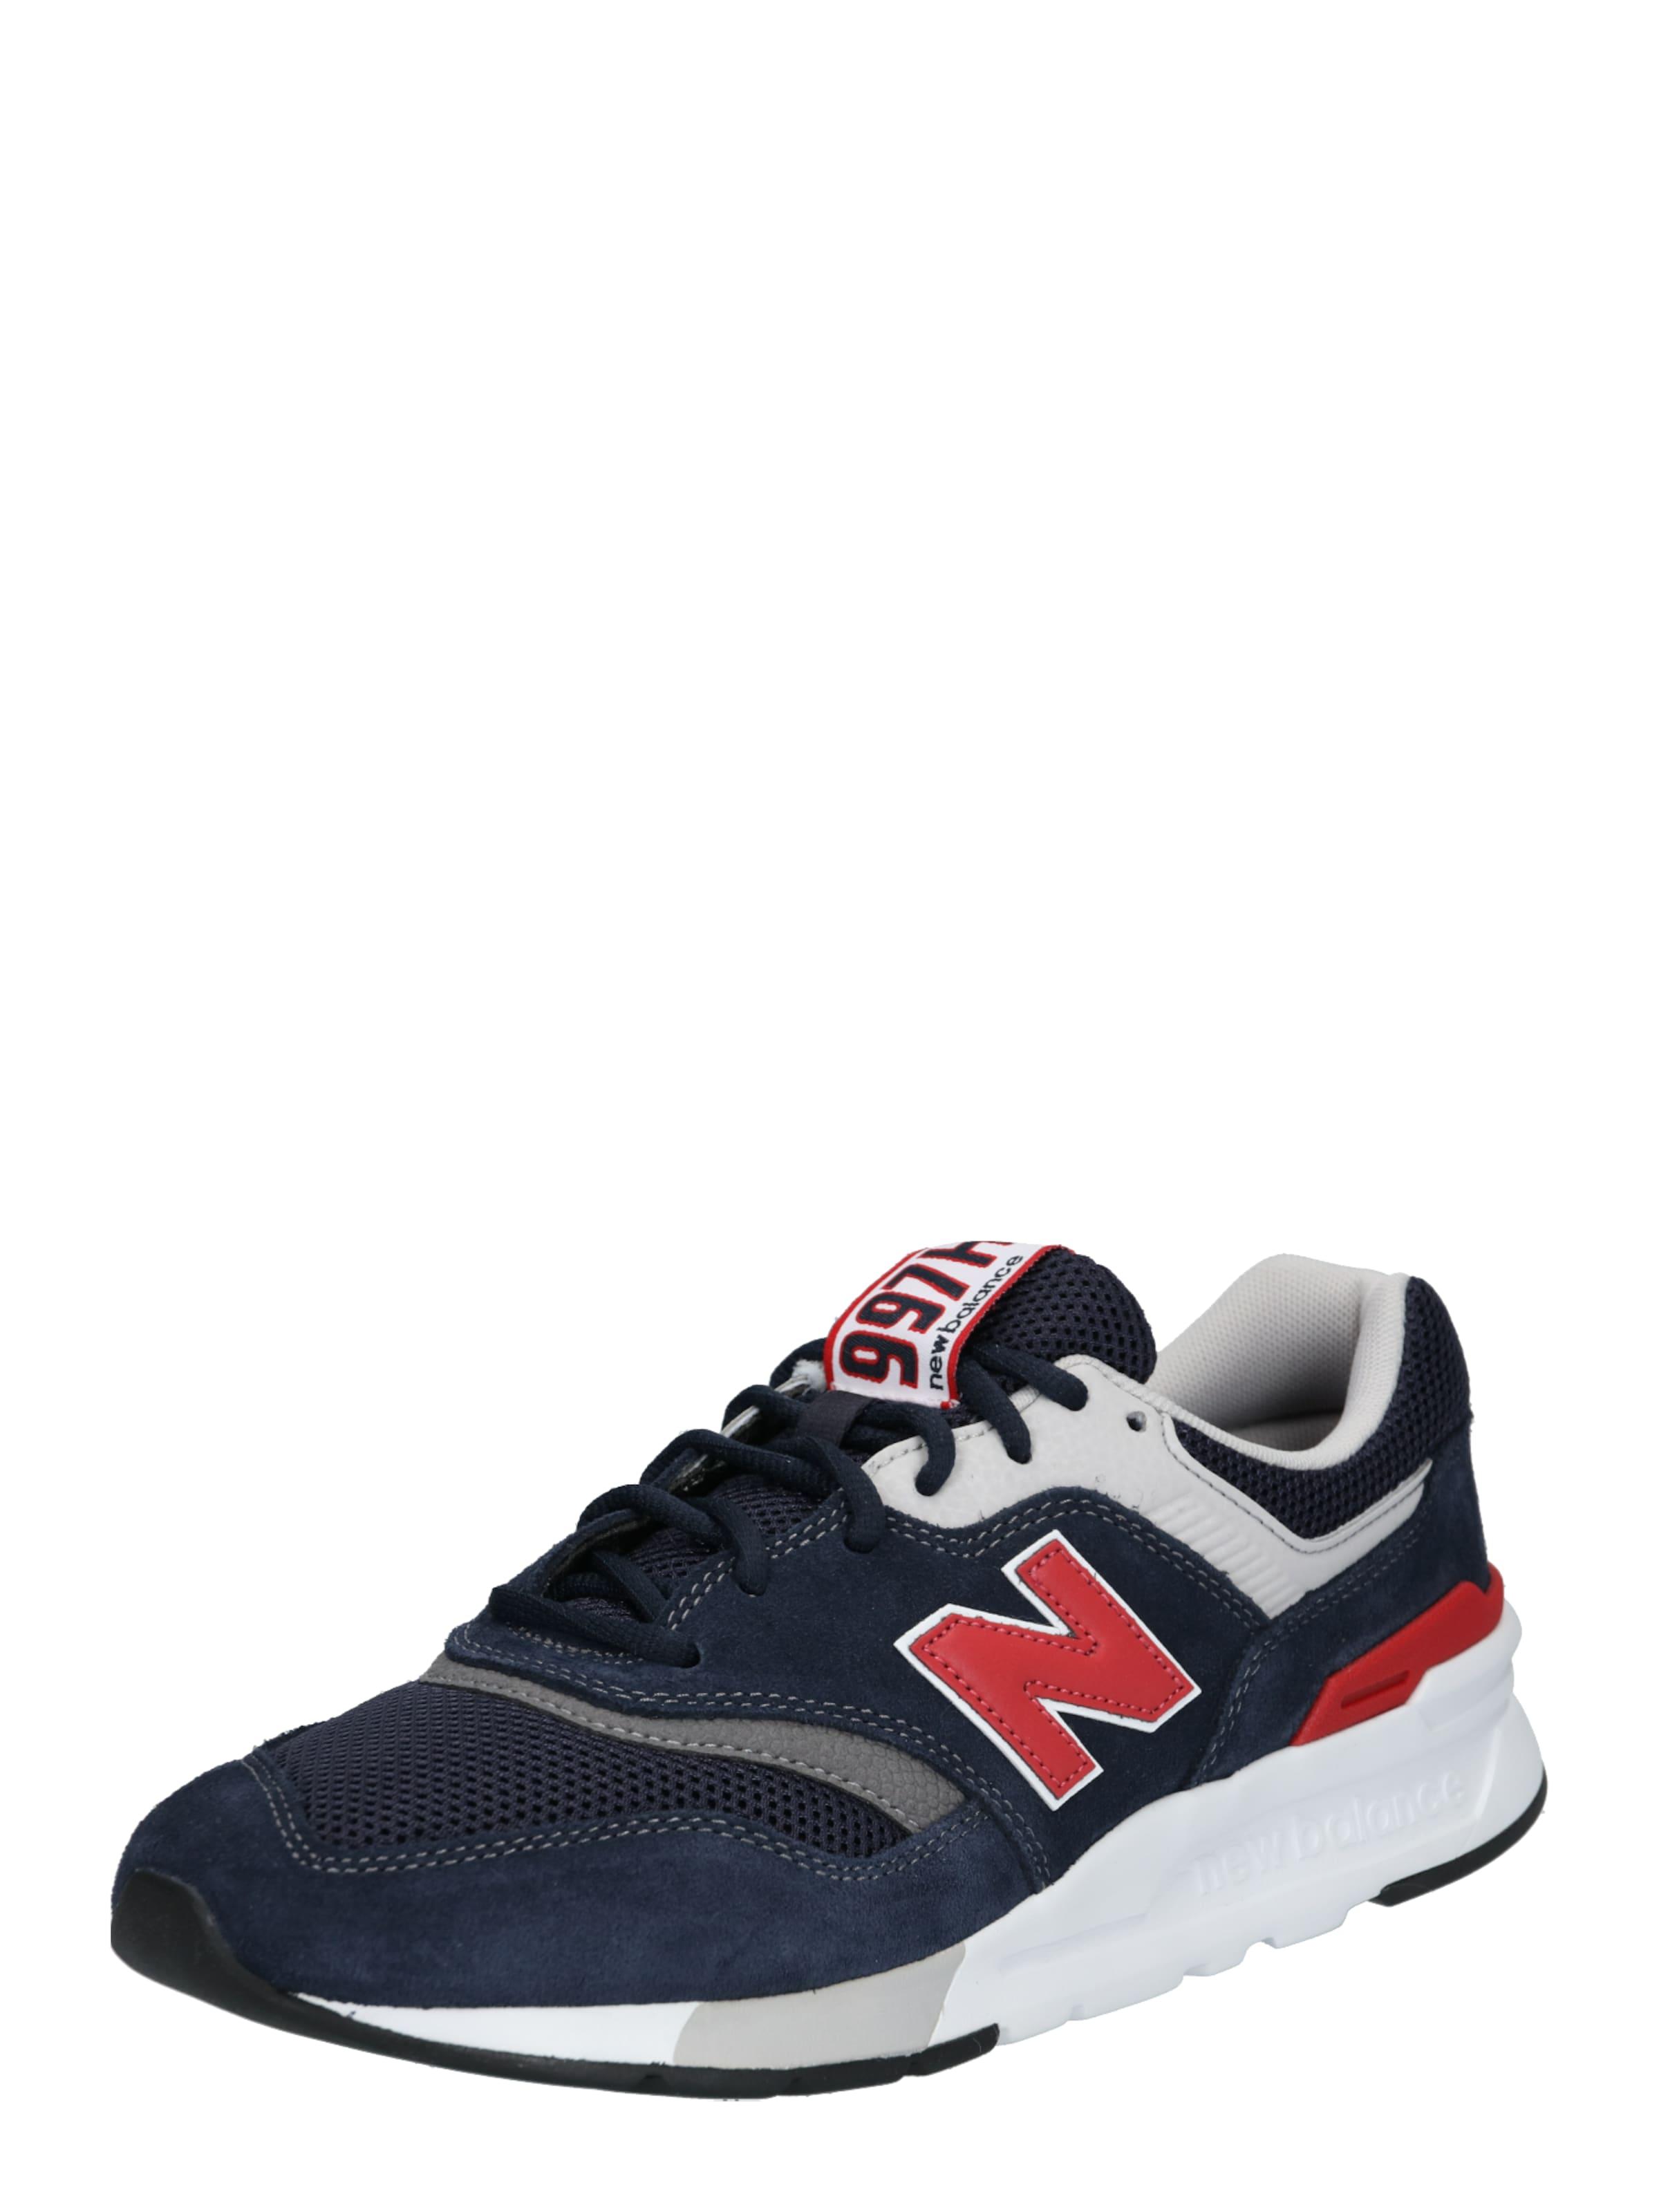 In NavyRot Sneaker Weiß Balance New 'cm997h' 0wZOk8NnPX